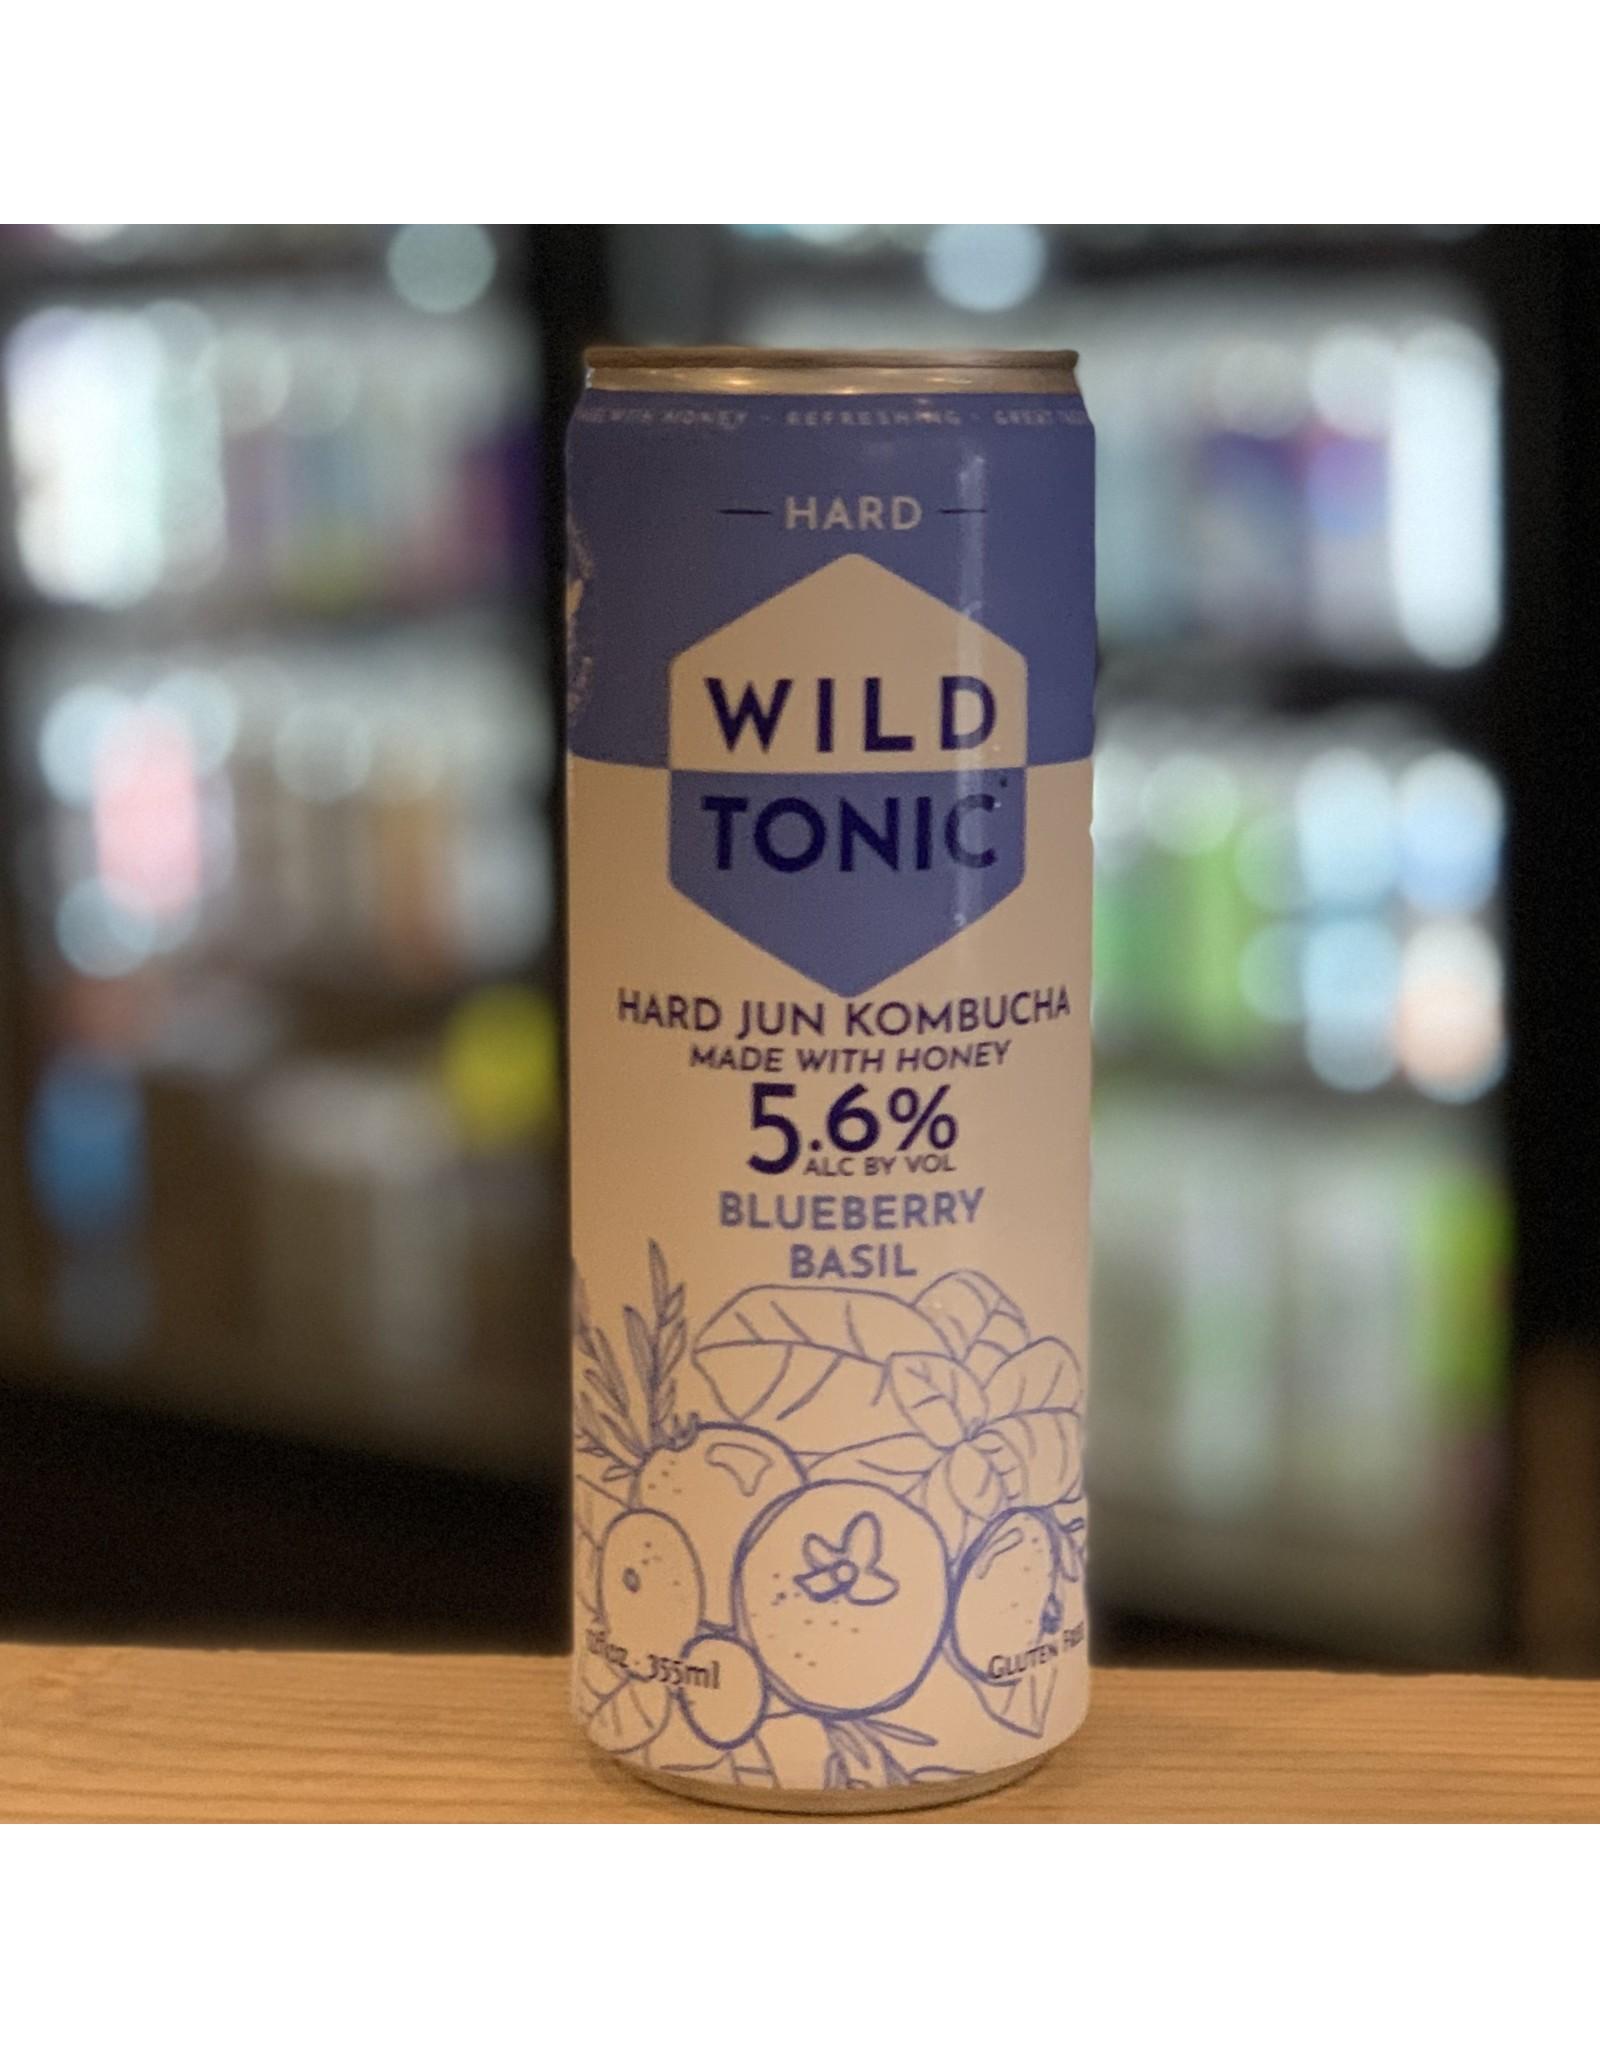 Hard Seltzer Good Omen Bottling ''Wild Tonic'' Hard Jun Kombucha w/Blueberry and Basil - Cottonwood, AZ